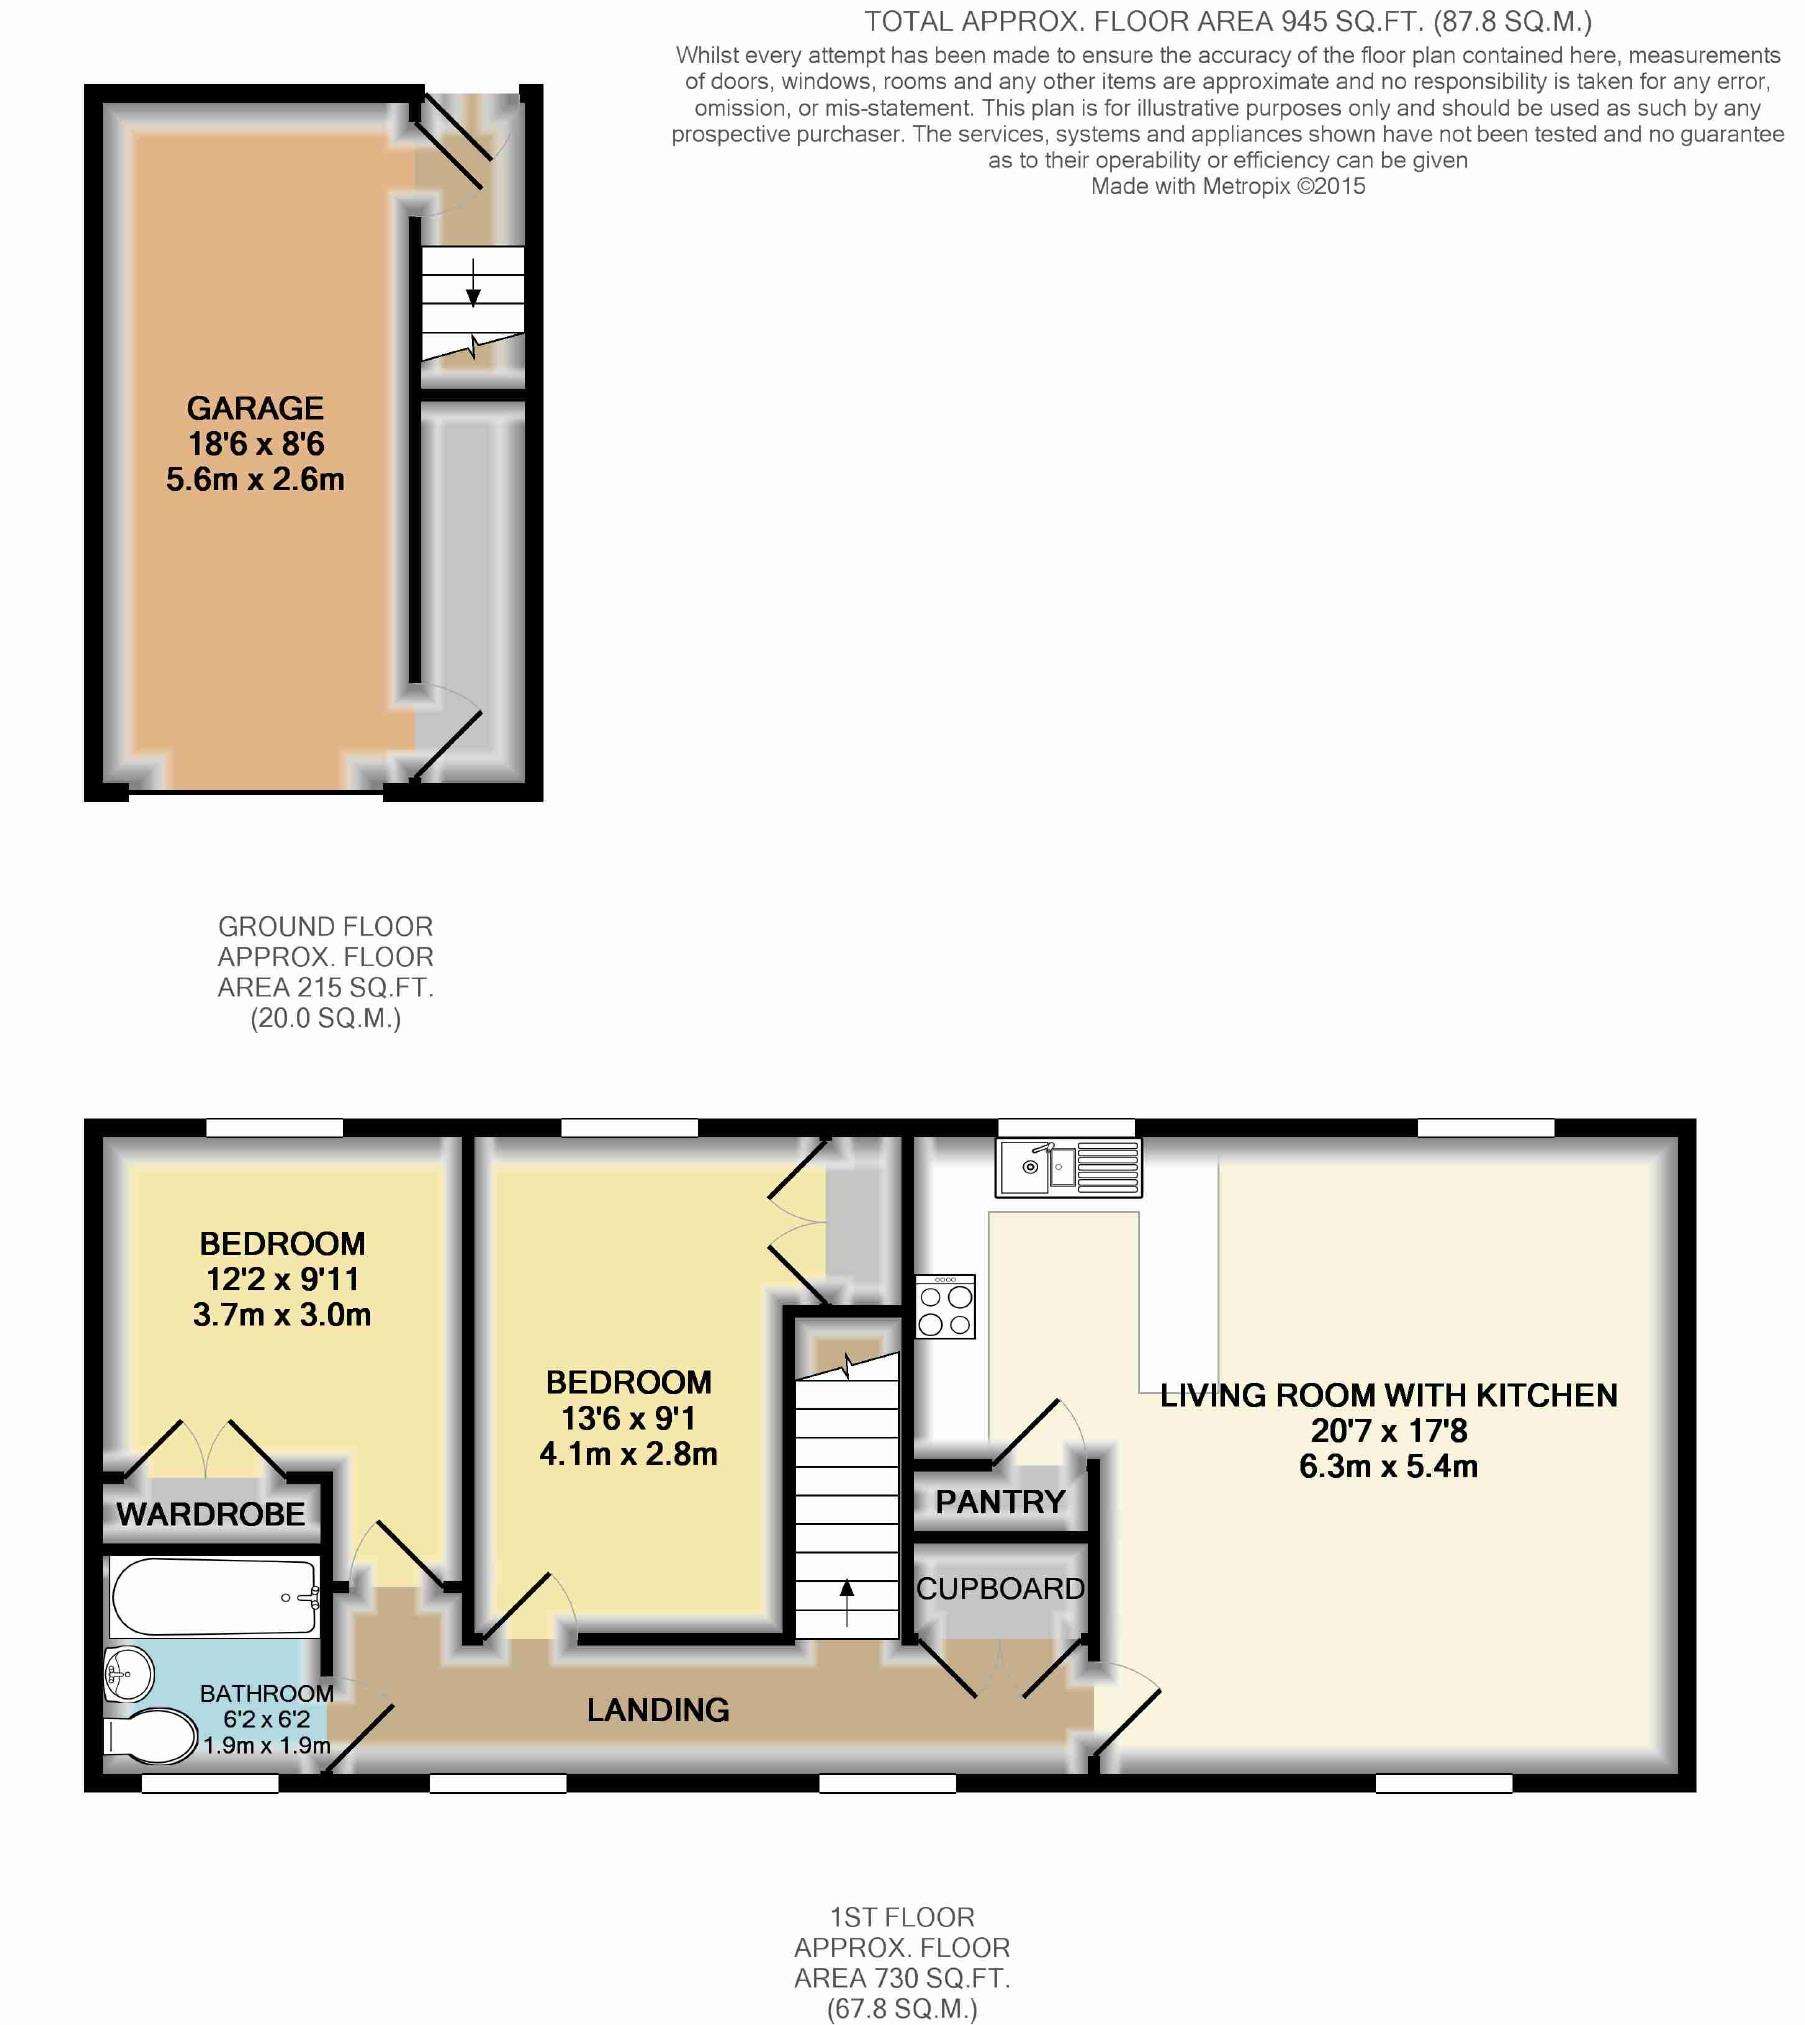 7x9 bathroom layout bathroom design ideas for Bathroom design 7x7